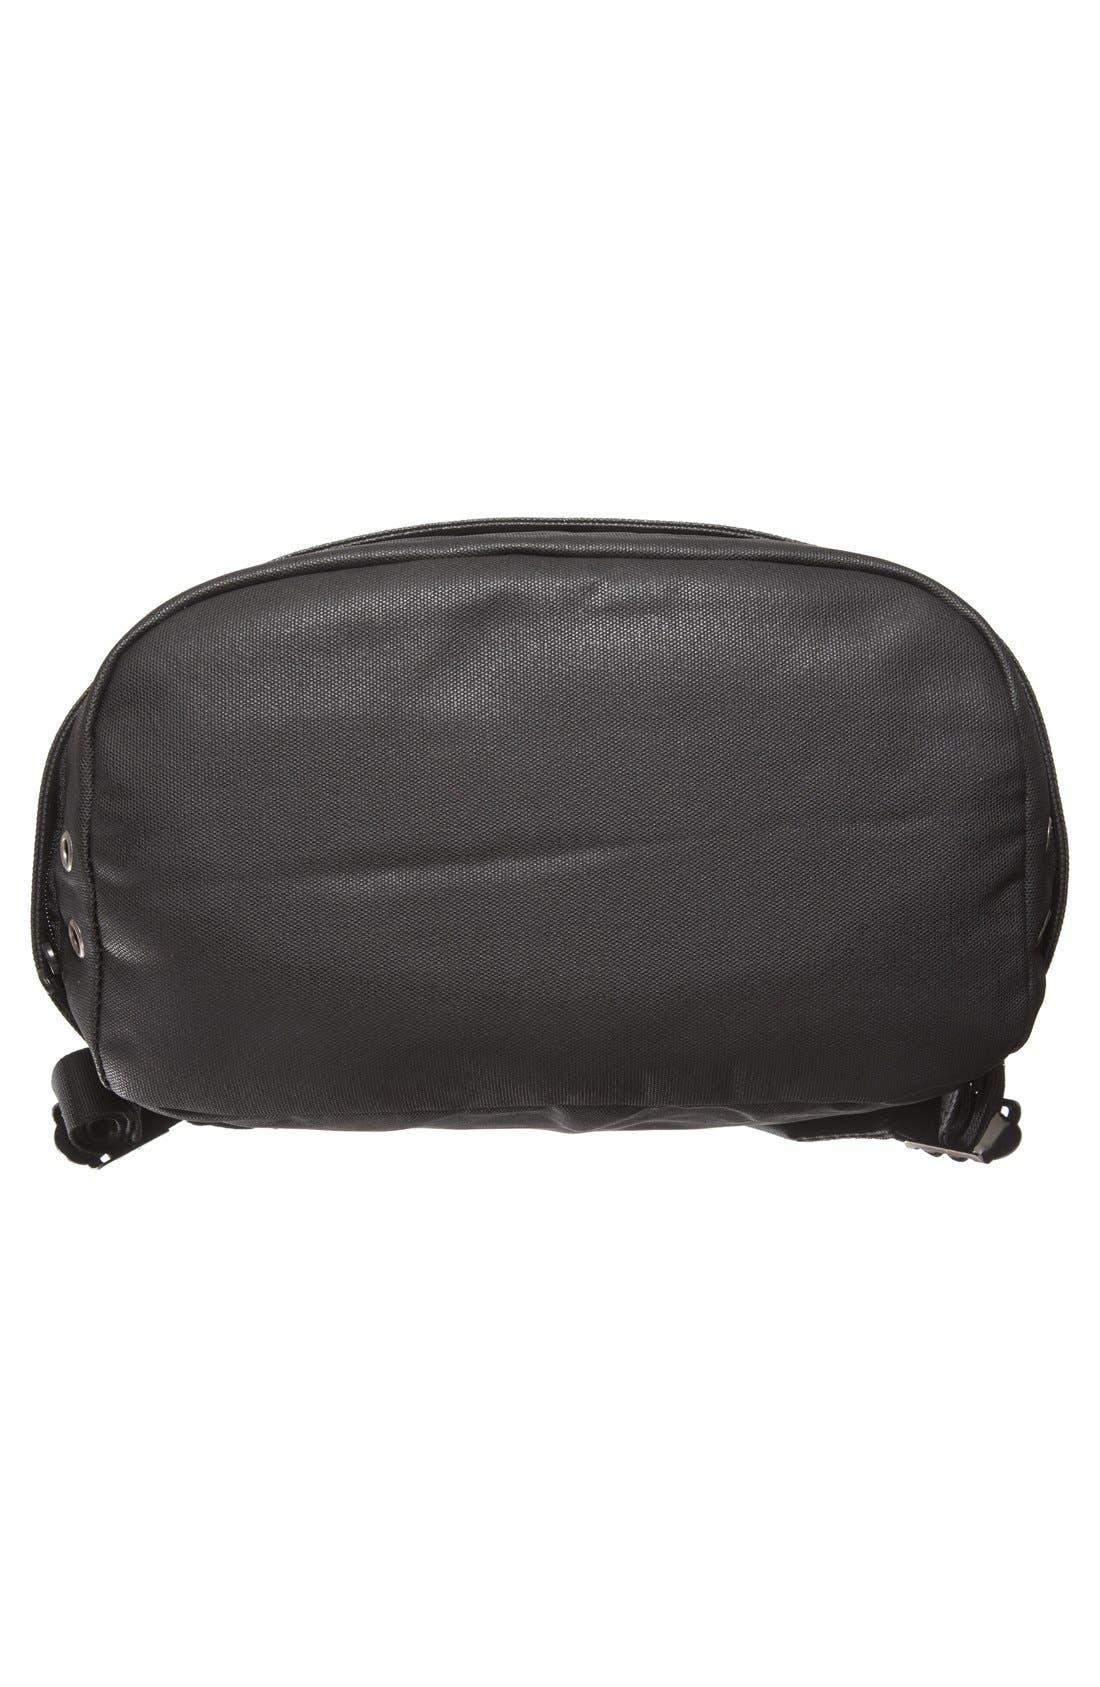 STATE BAGS,                             'Lenox' Backpack,                             Alternate thumbnail 6, color,                             001